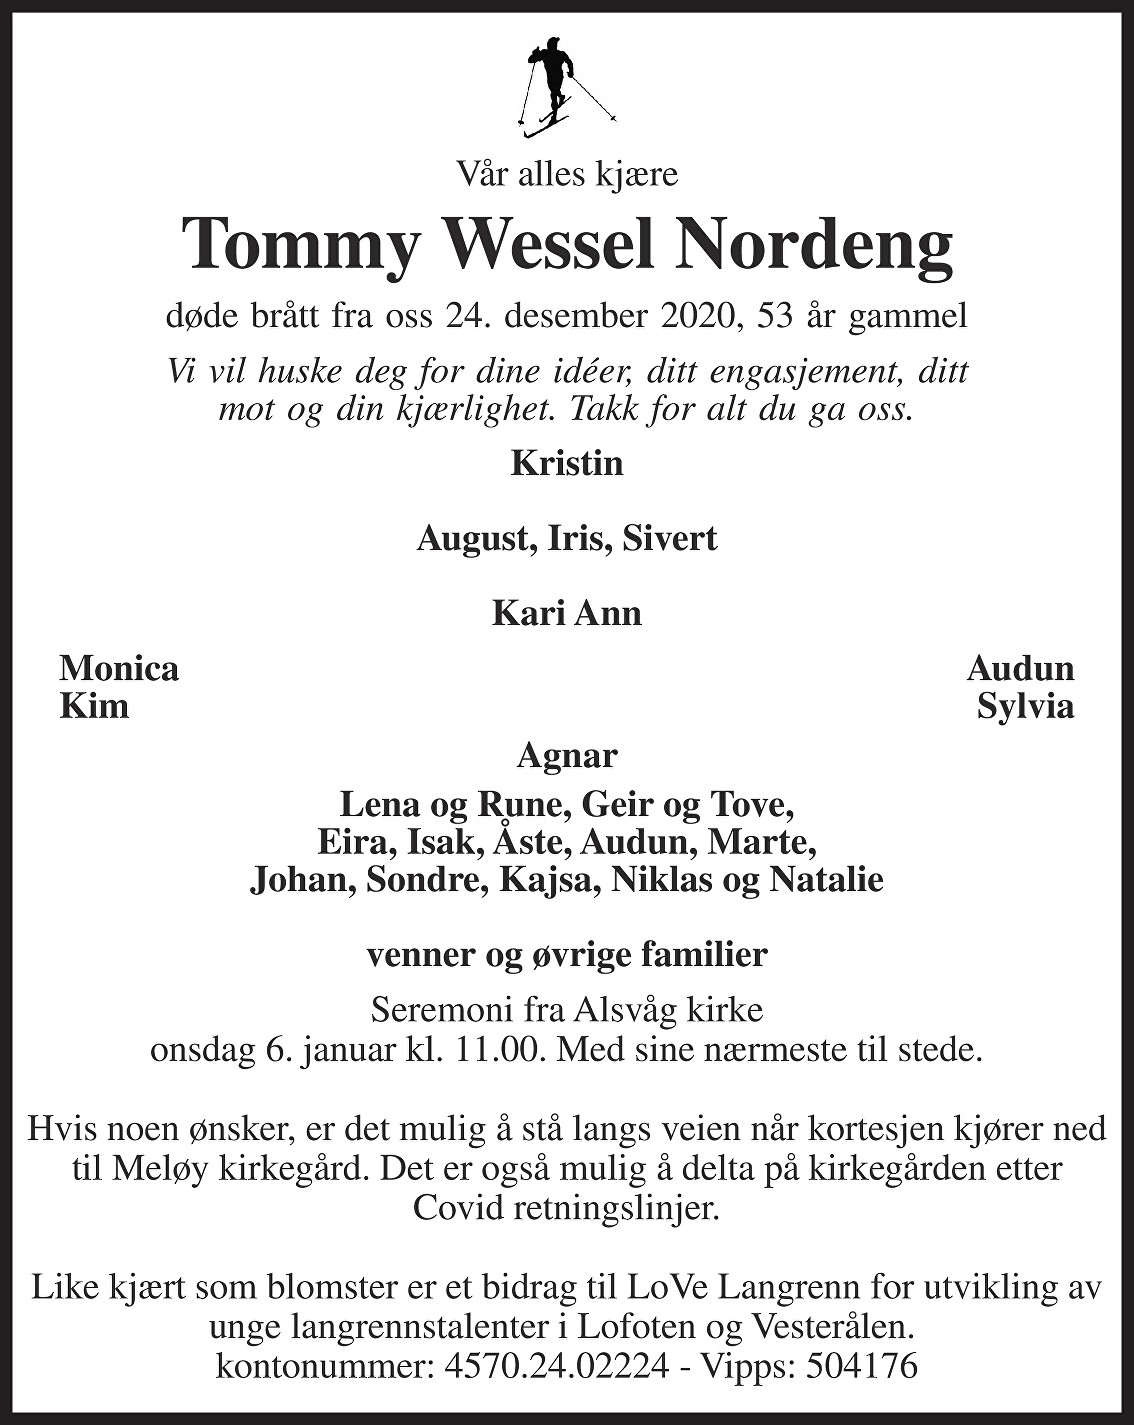 Tommy Wessel Nordeng Dødsannonse